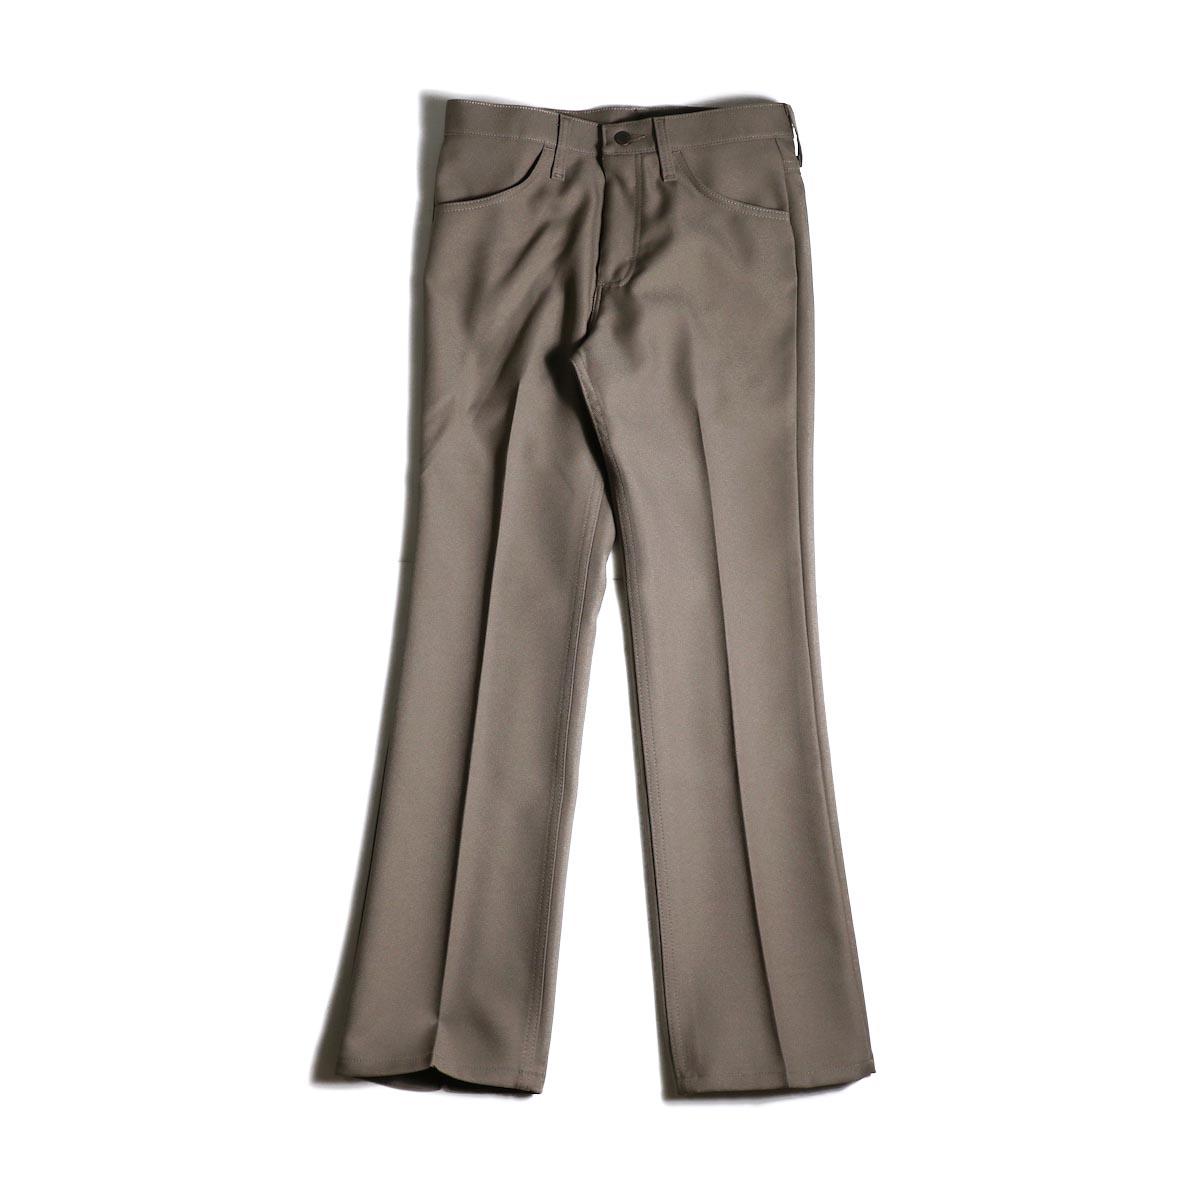 Wrangler / WRANCHER DRESS JEANS (Birch)